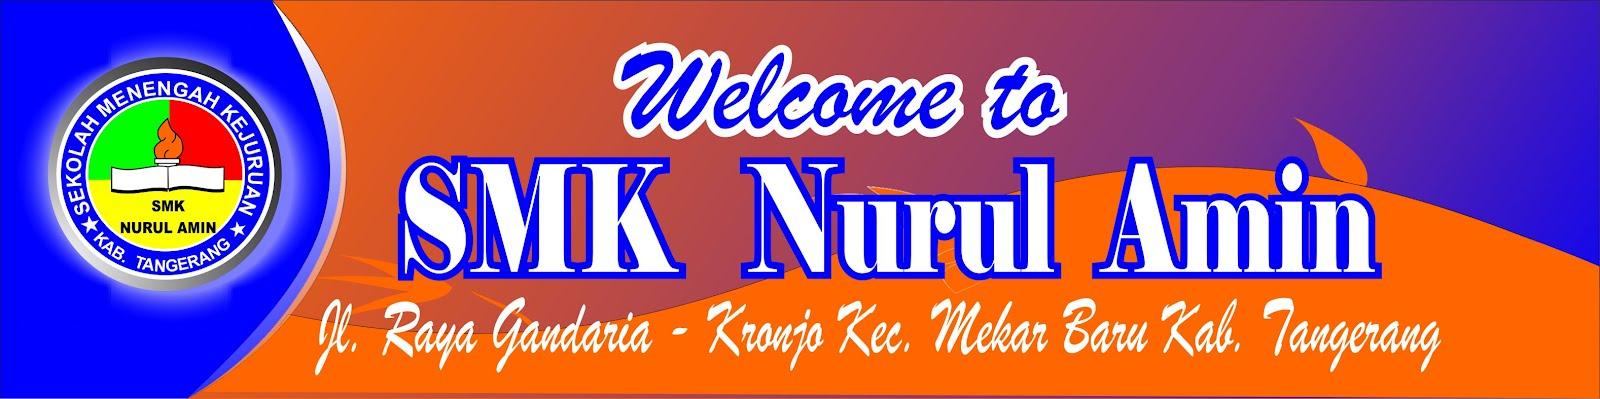 SMK Nurul Amin Kab. Tangerang